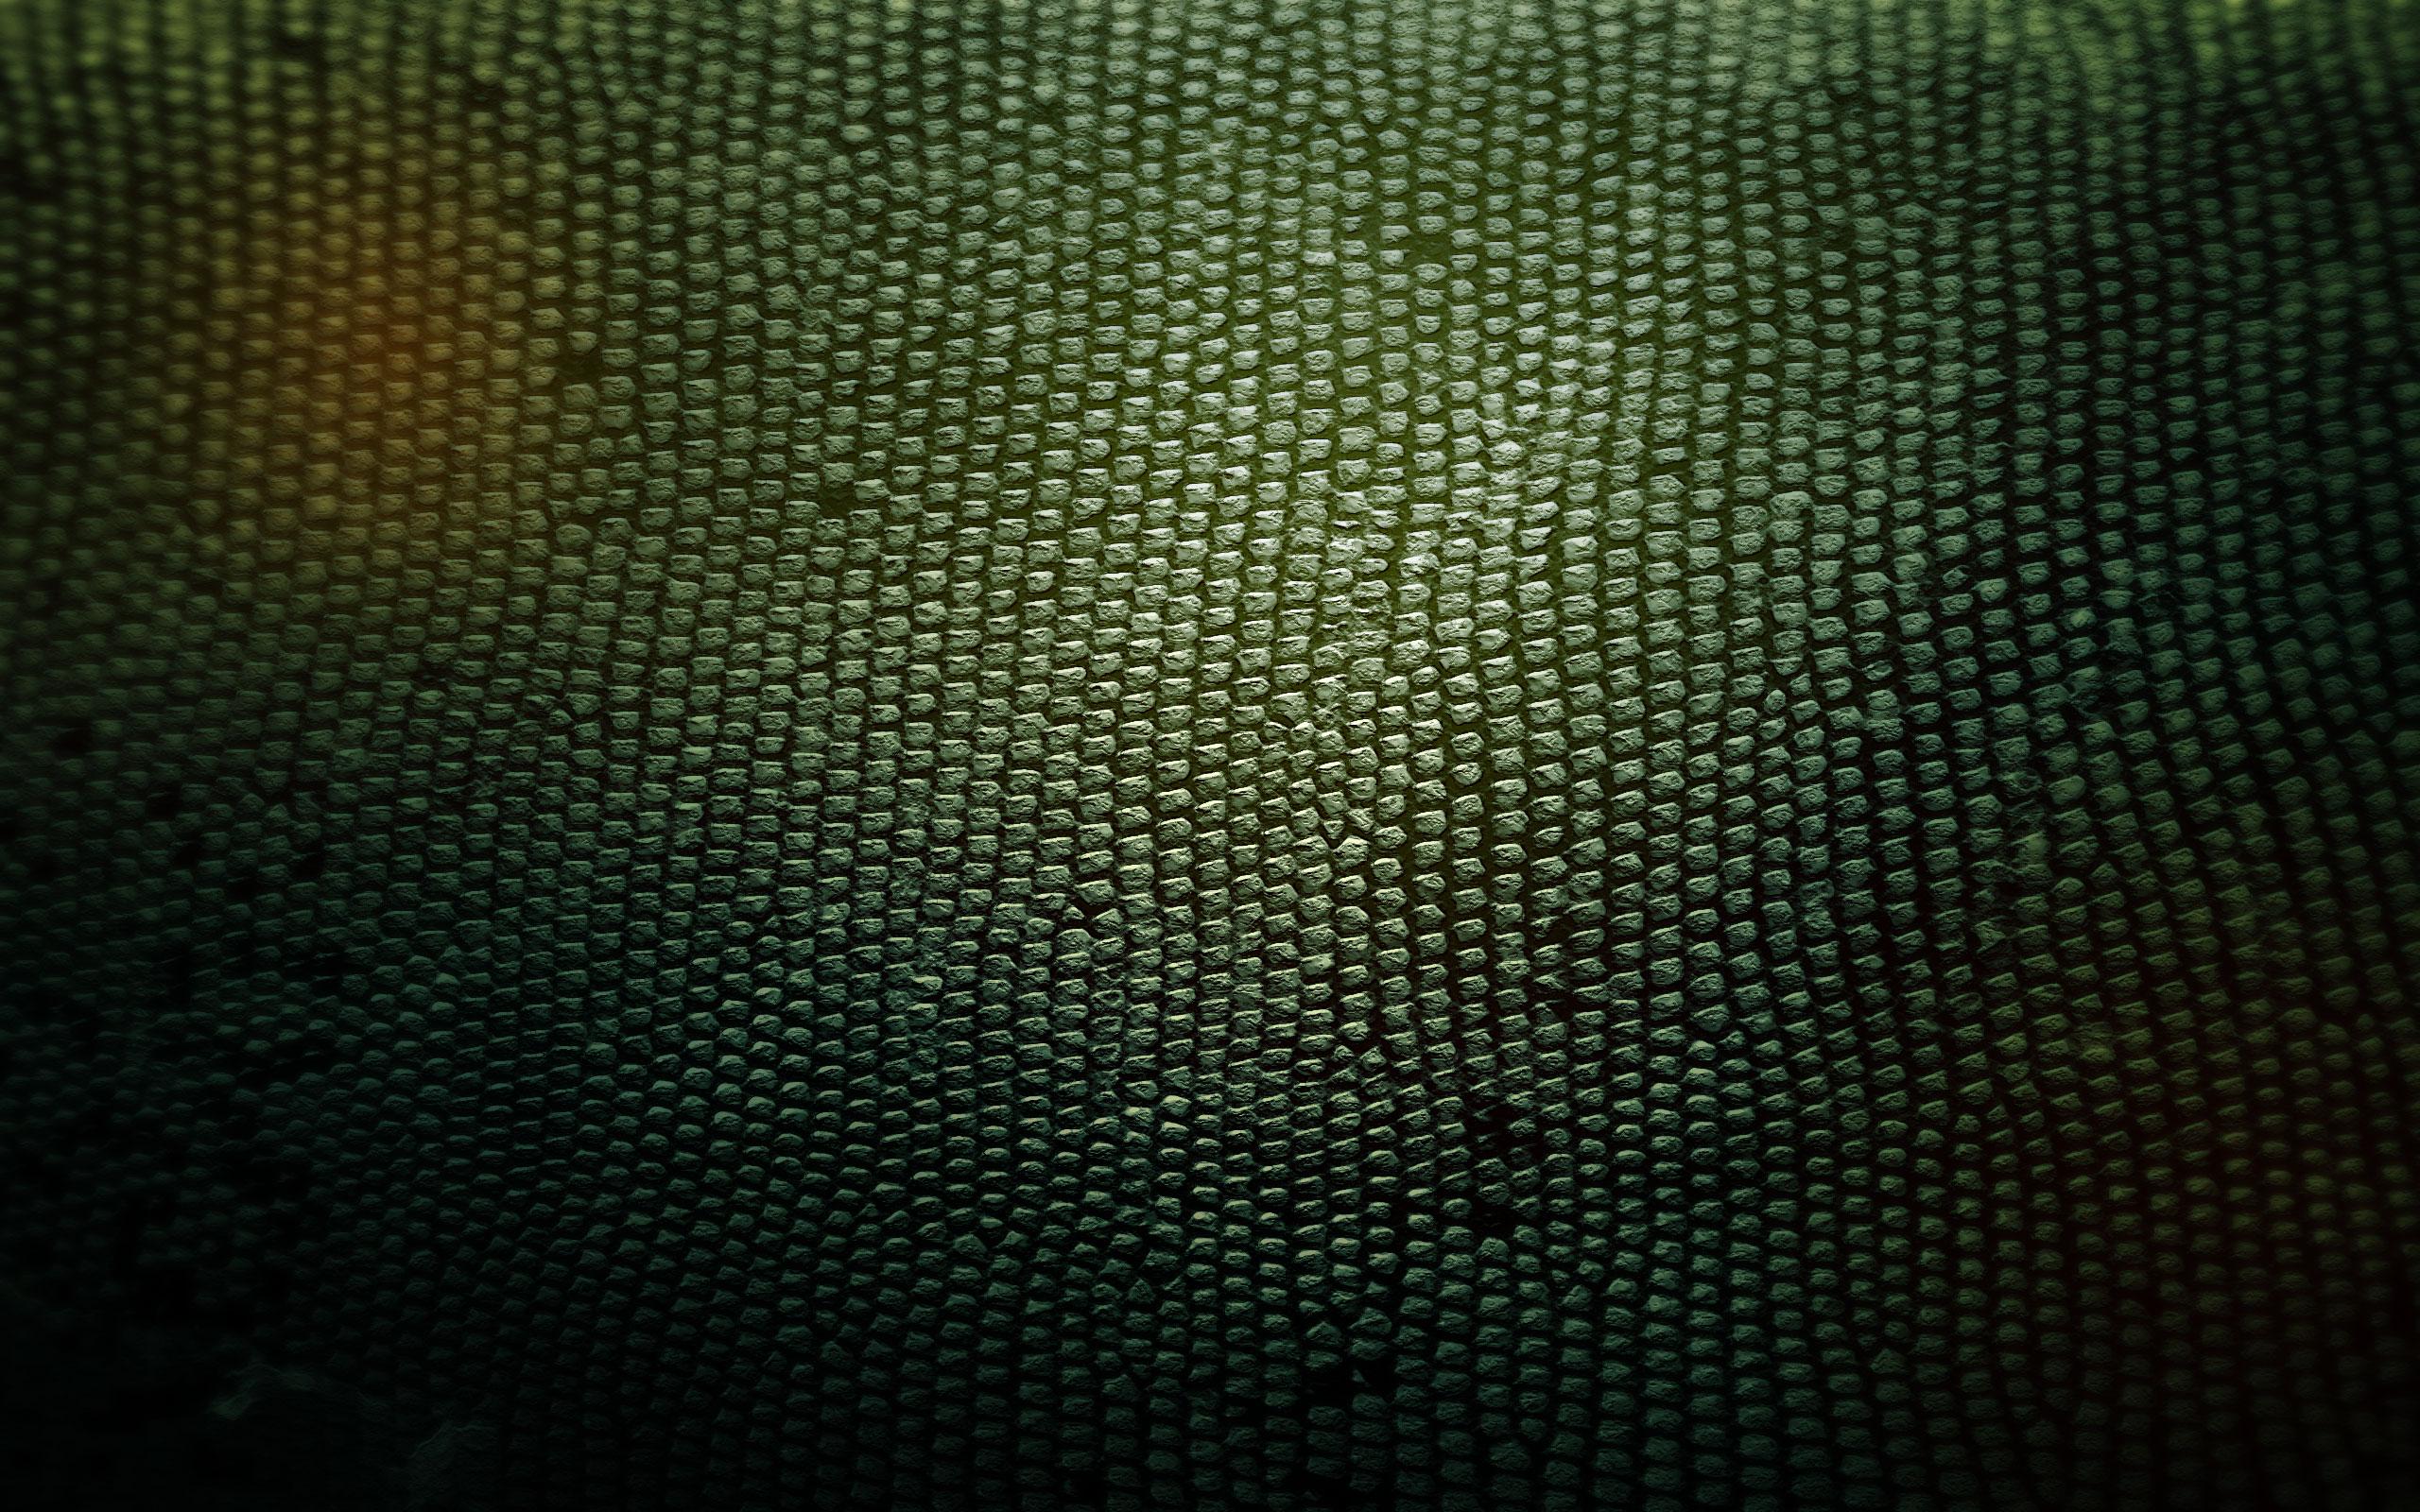 snakes texture skin